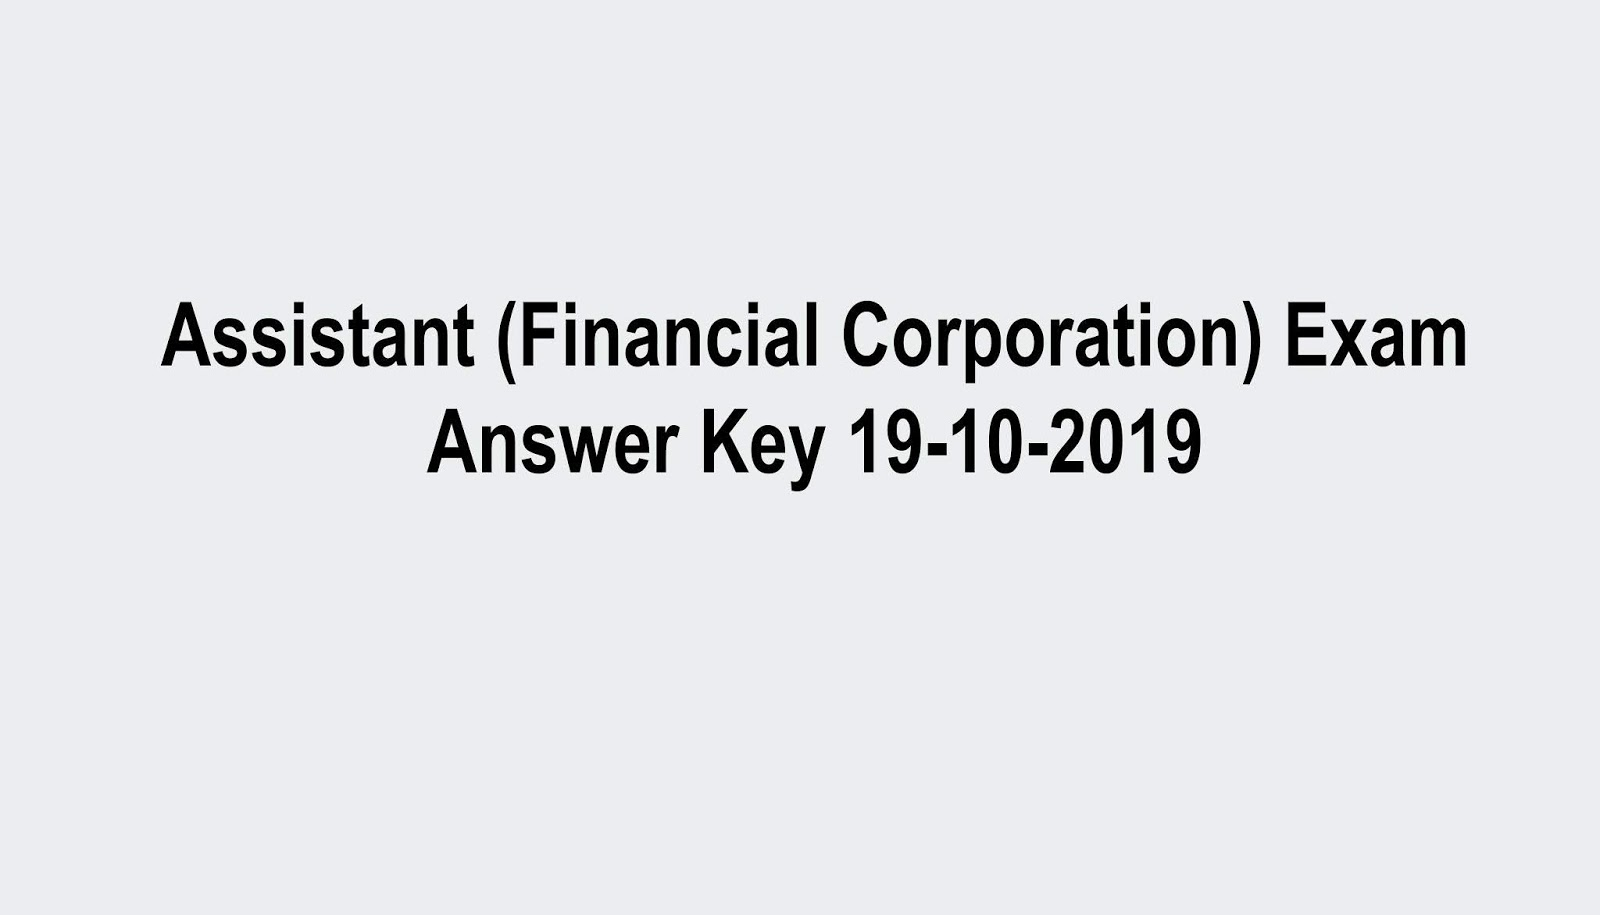 Kerala PSC Assistant (Financial Corporation) Exam Answer Key